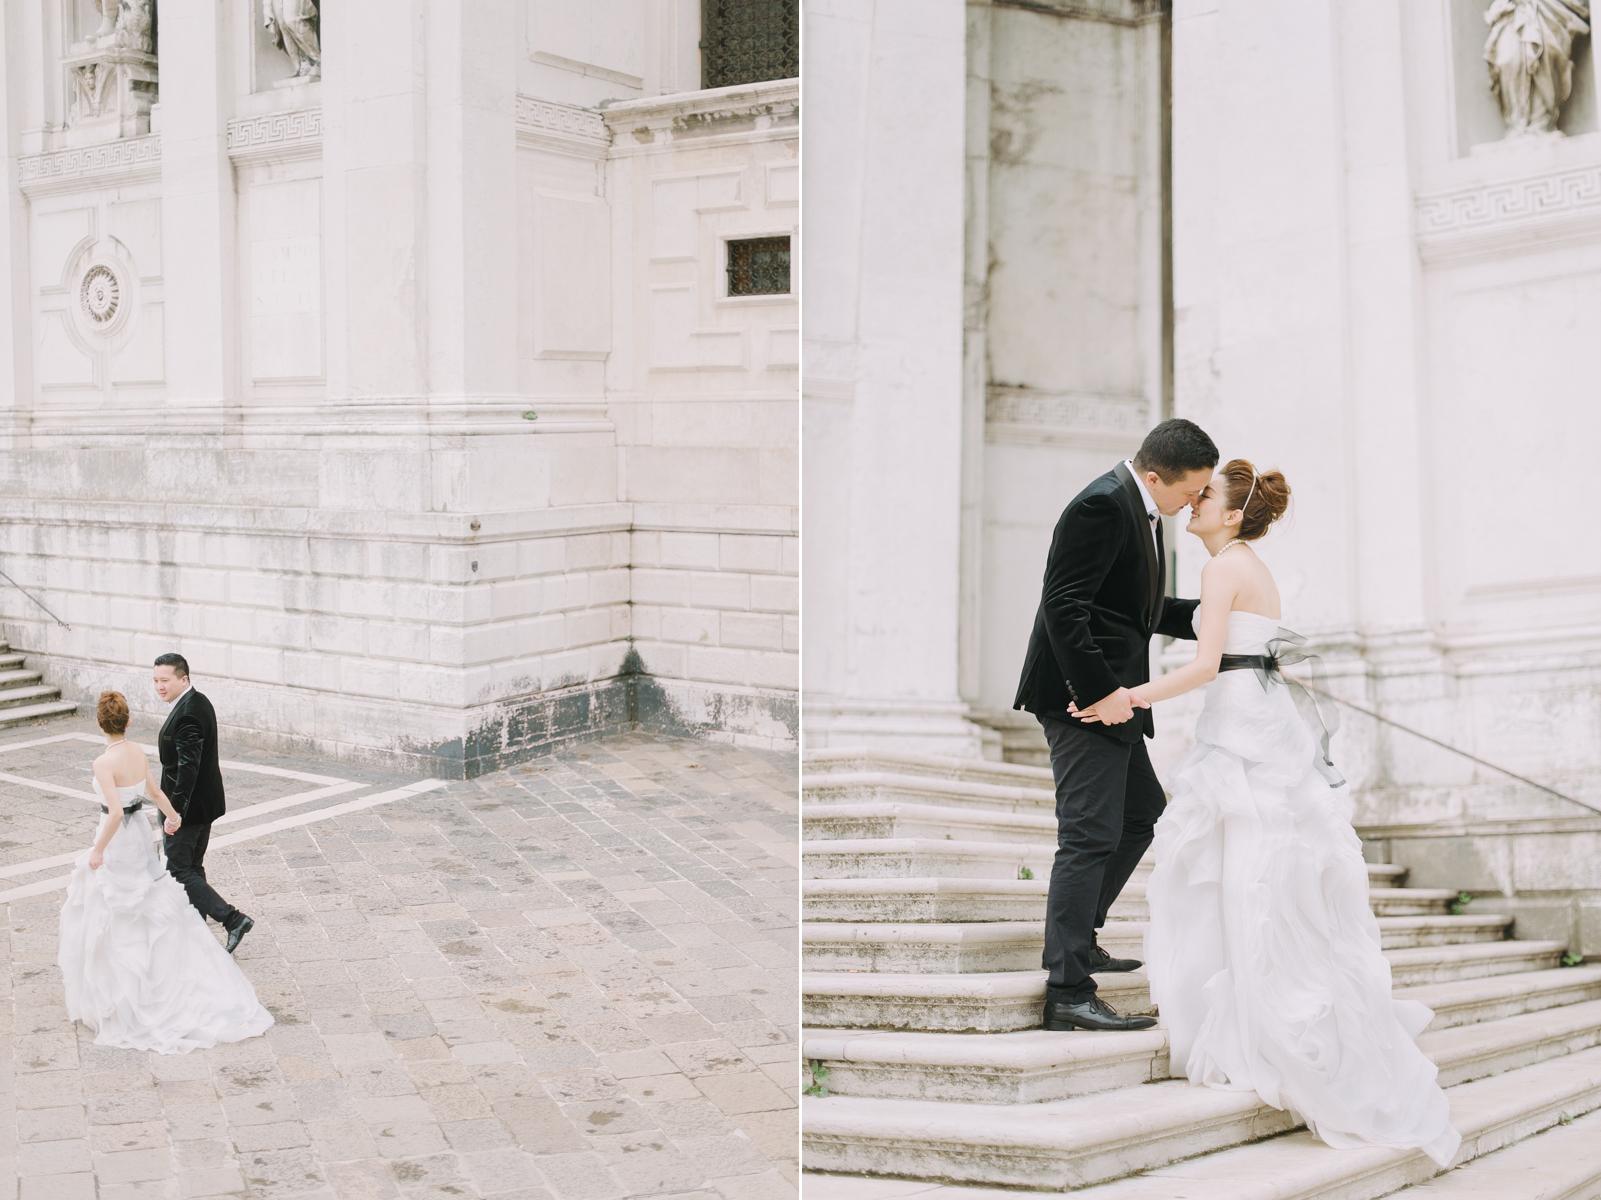 Boheme Moon Fine Art Wedding Photography - Pre-Wedding & honeymoon shoot in Venice, Italy